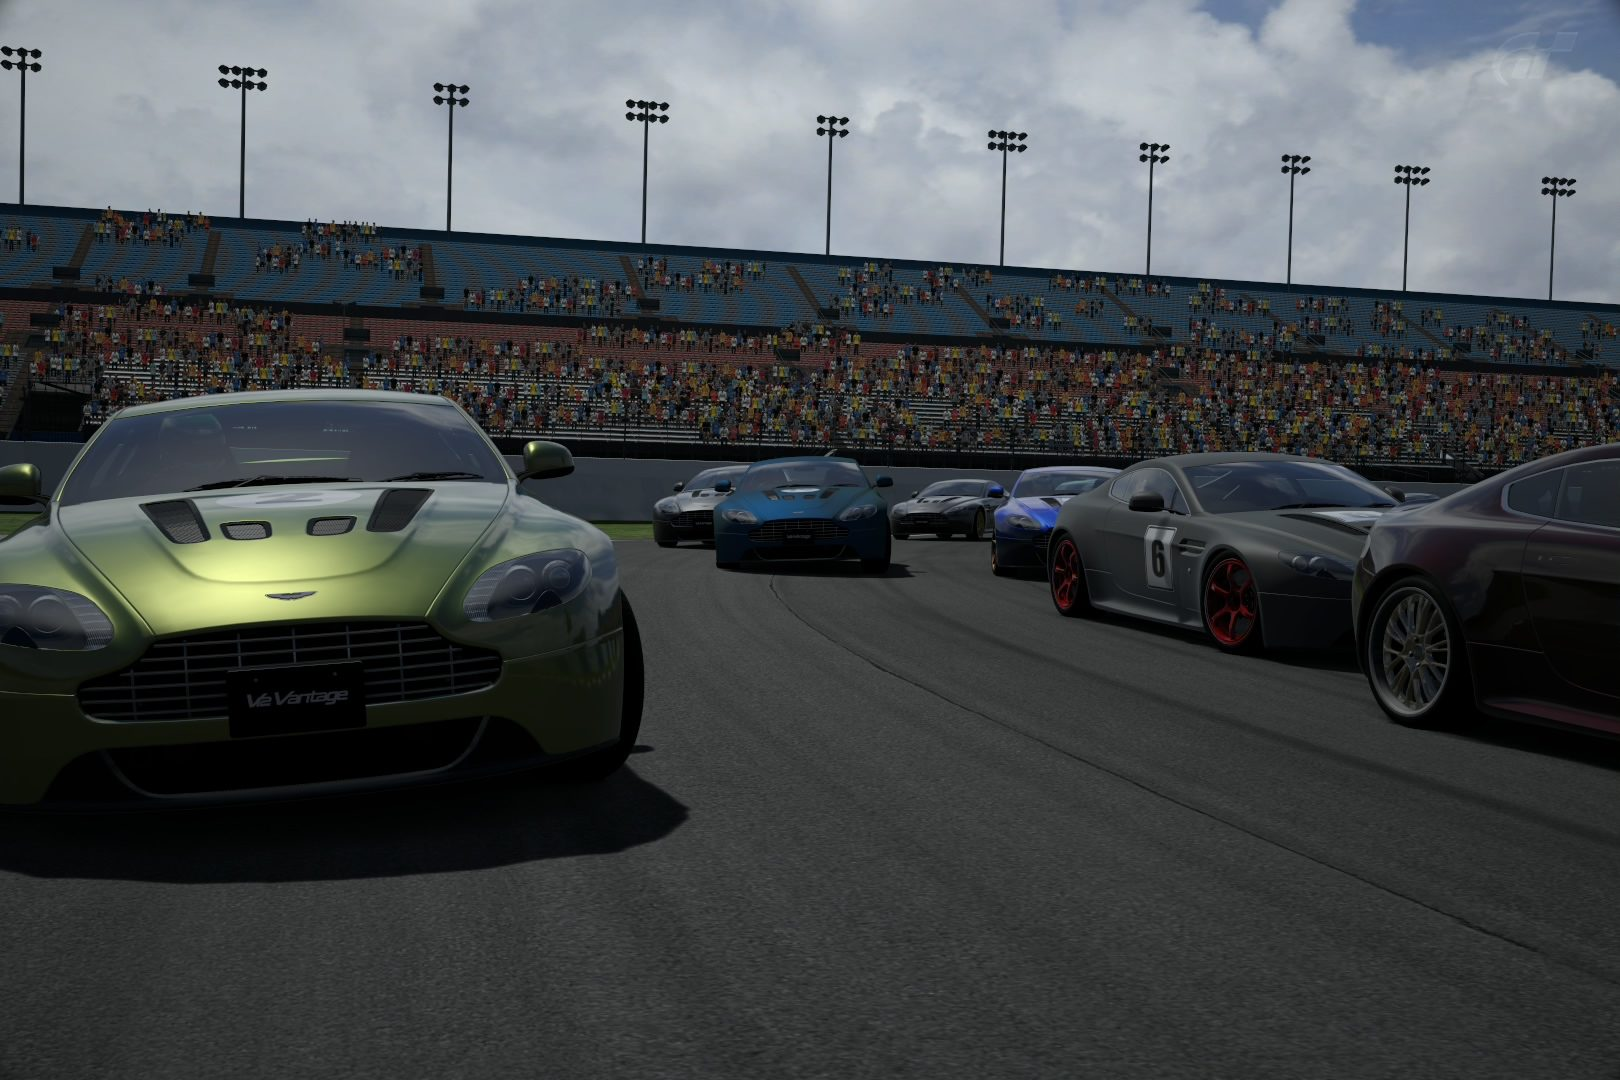 Daytona Road Course_31.jpg